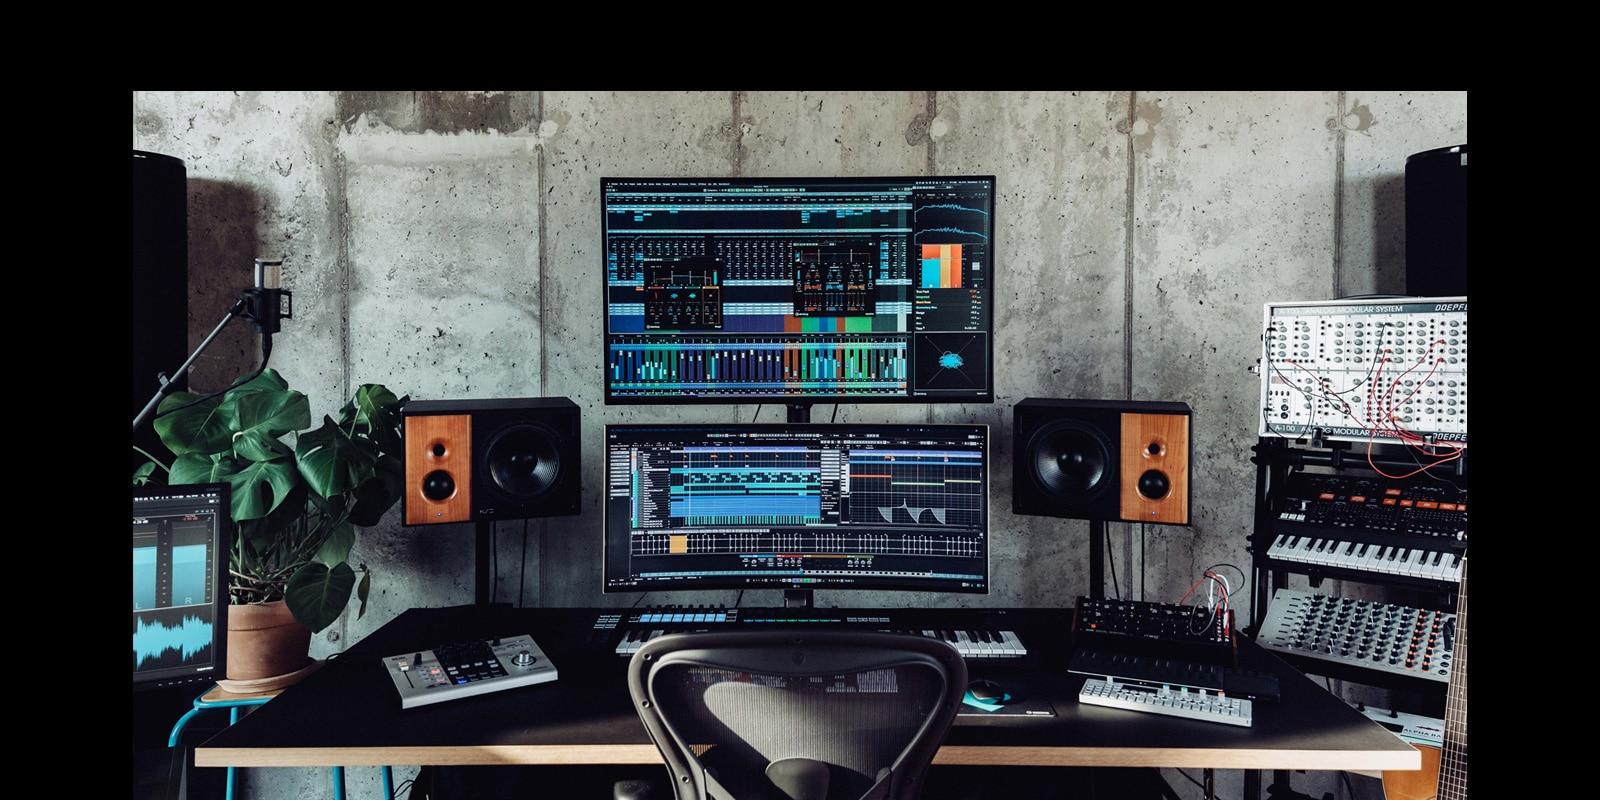 Steinberg Cubase 11 on screen in studio